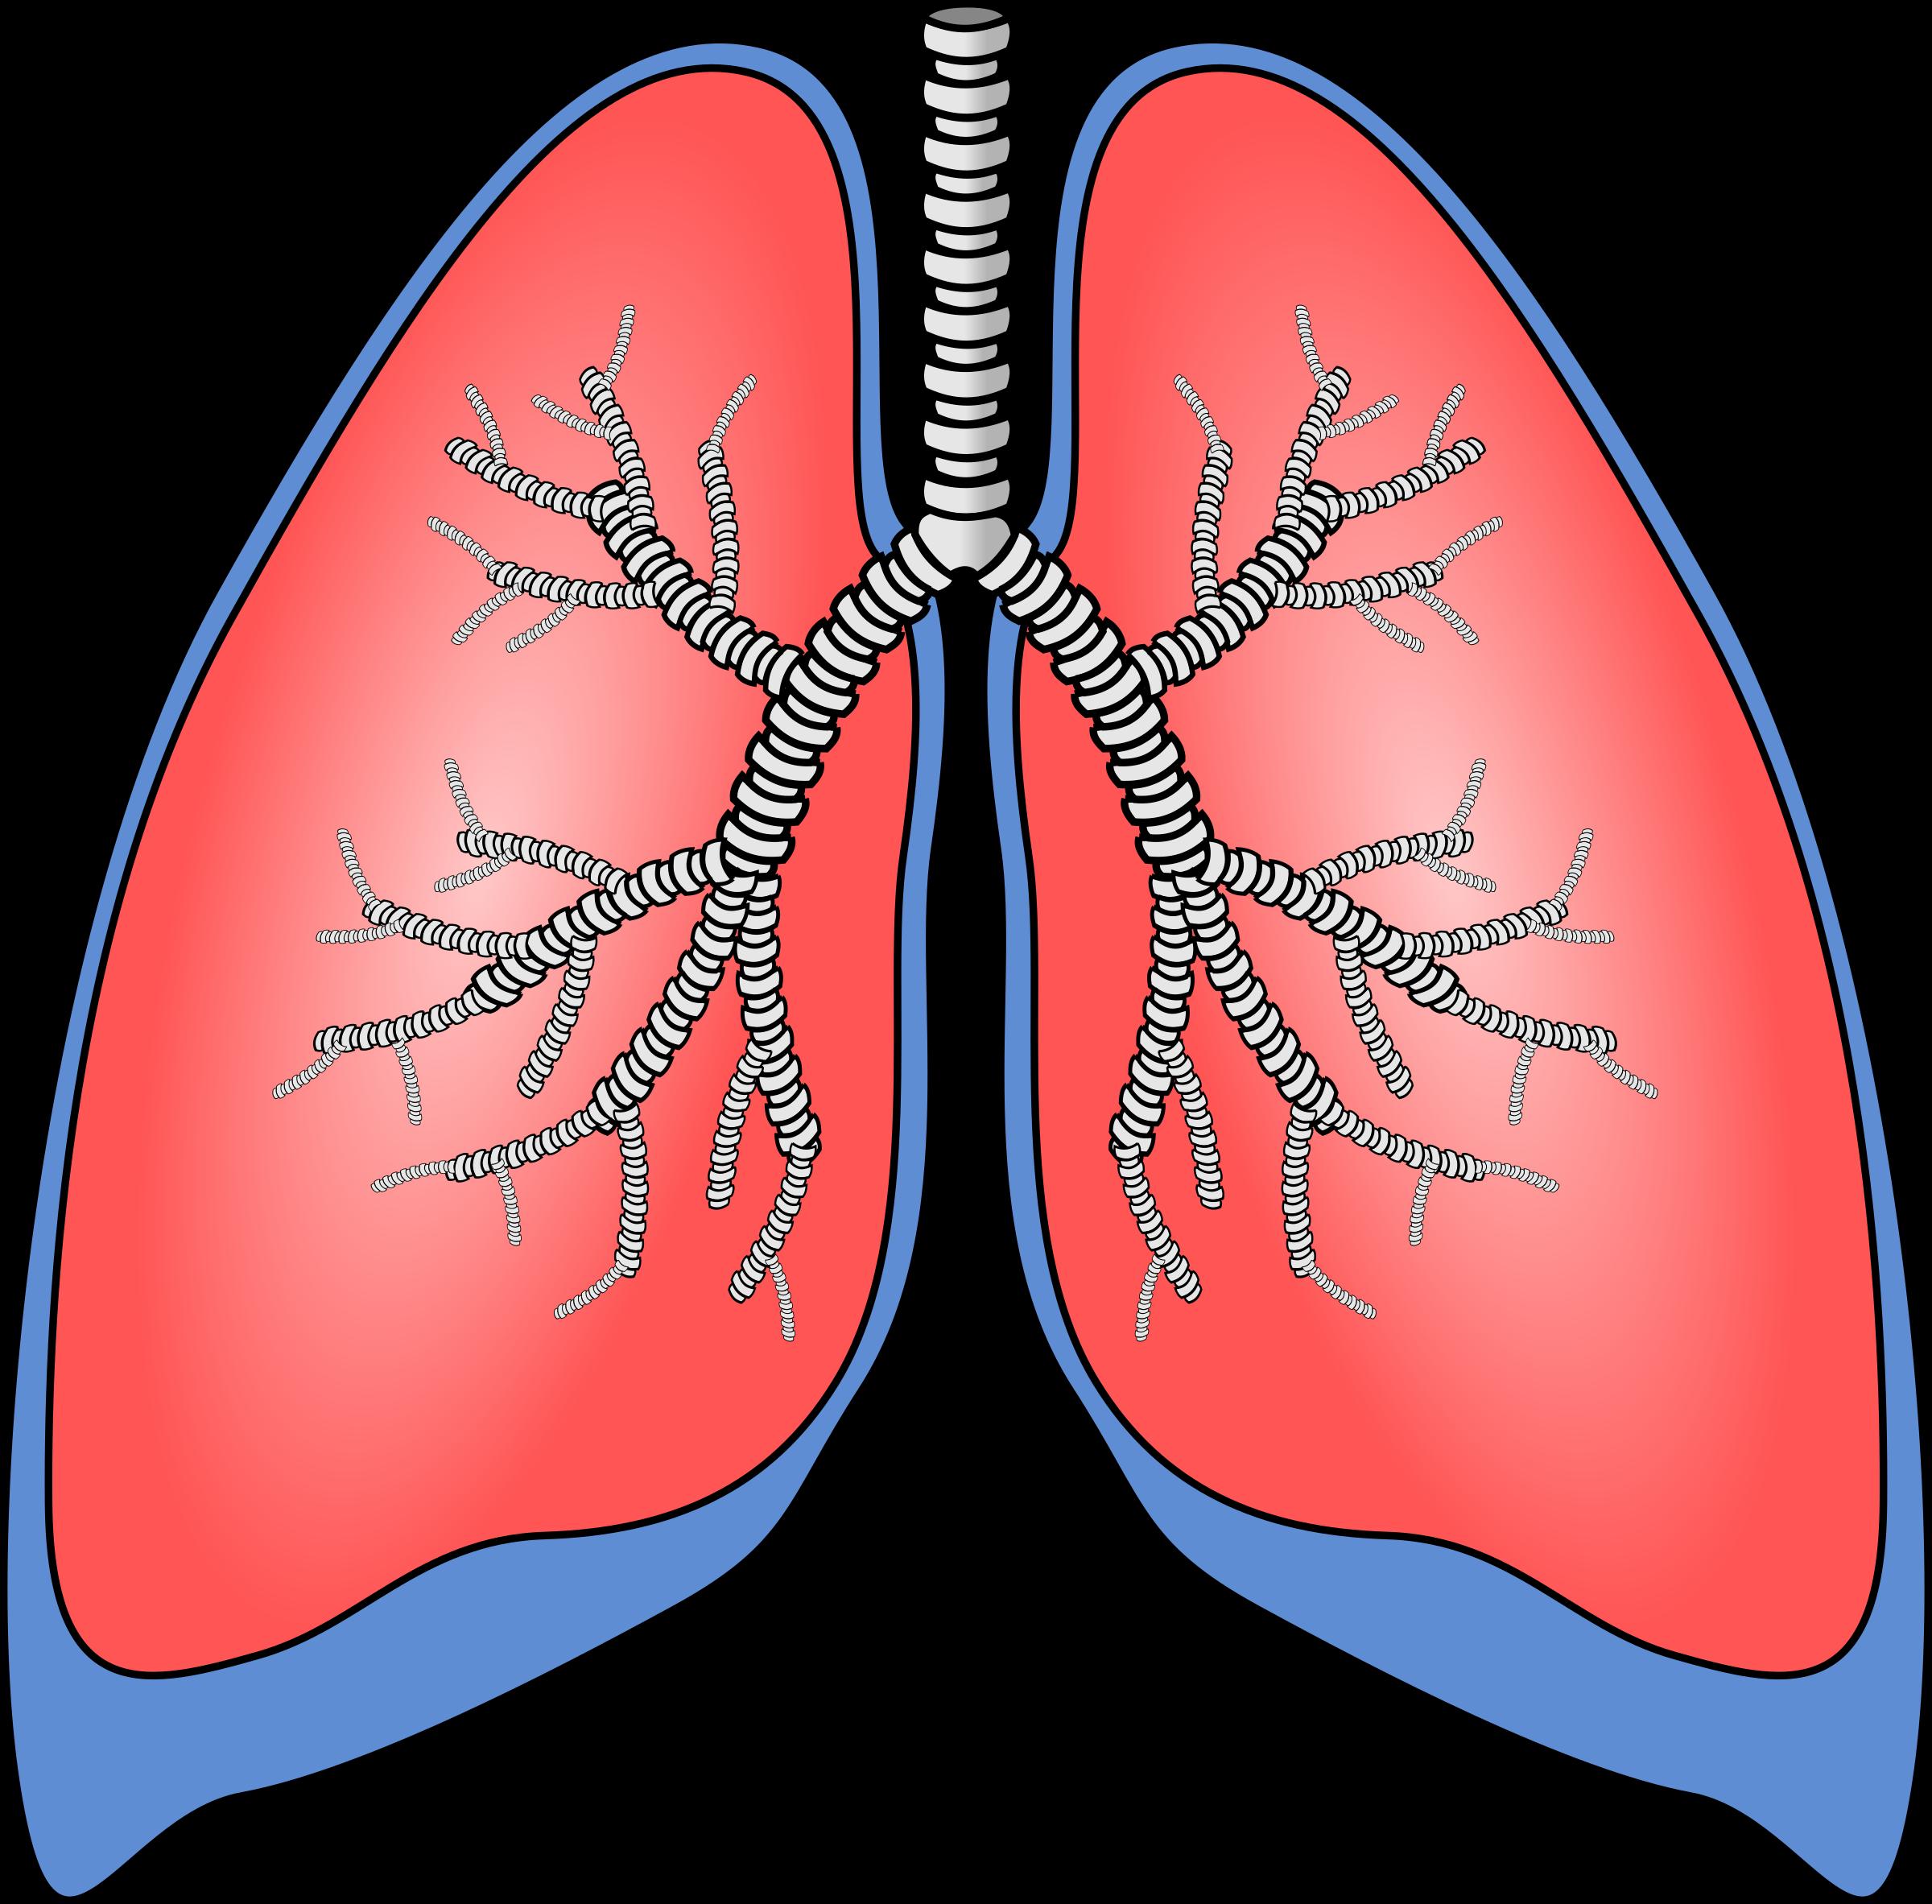 Polmoni - Lungs by krypt